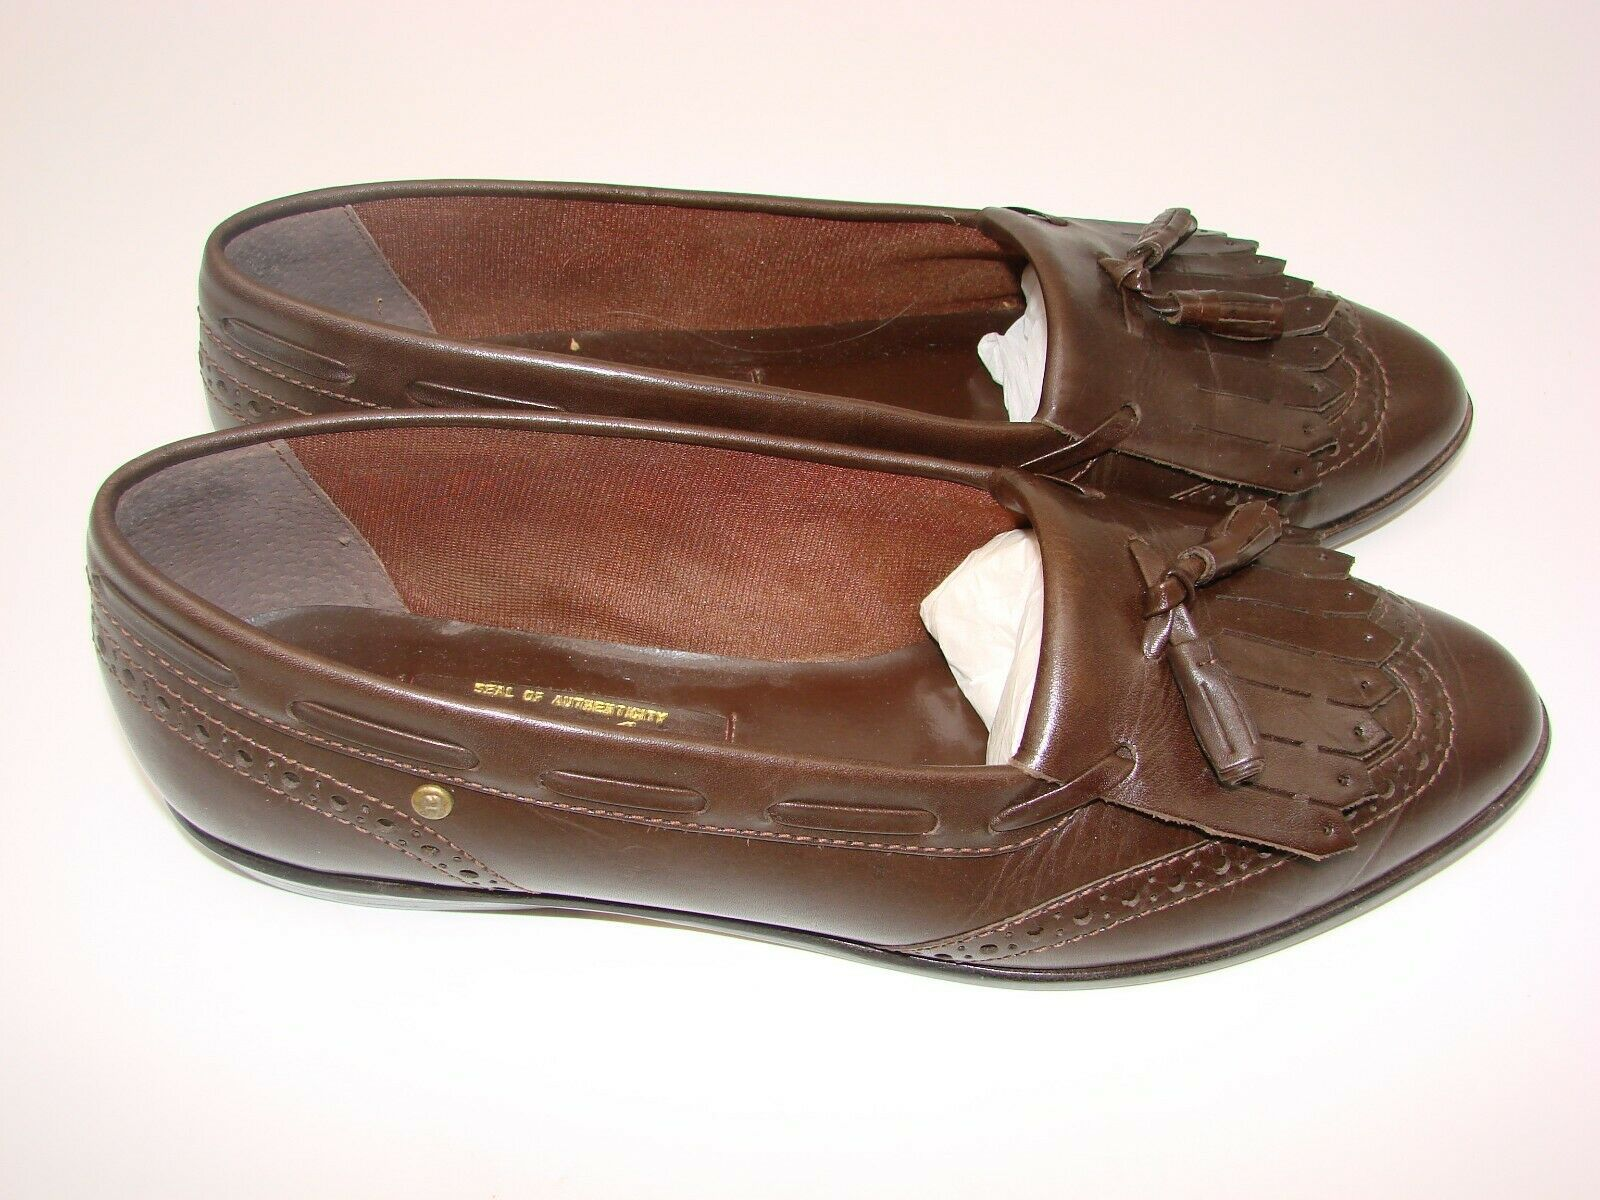 EUC Etienne Aigner Women's Tassel Slip On Pinch Loafers Dress 8 1/2M Brown